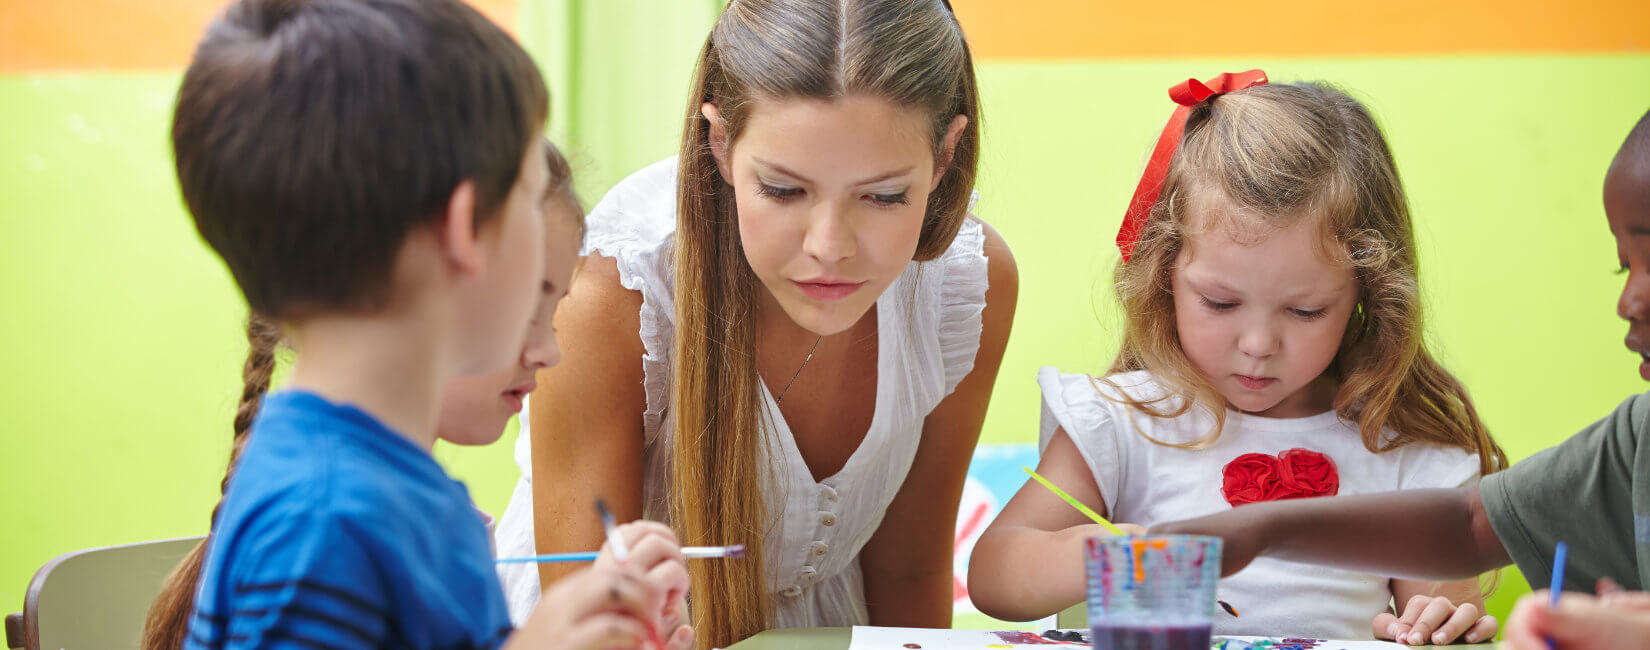 Safeguarding children training for childminders